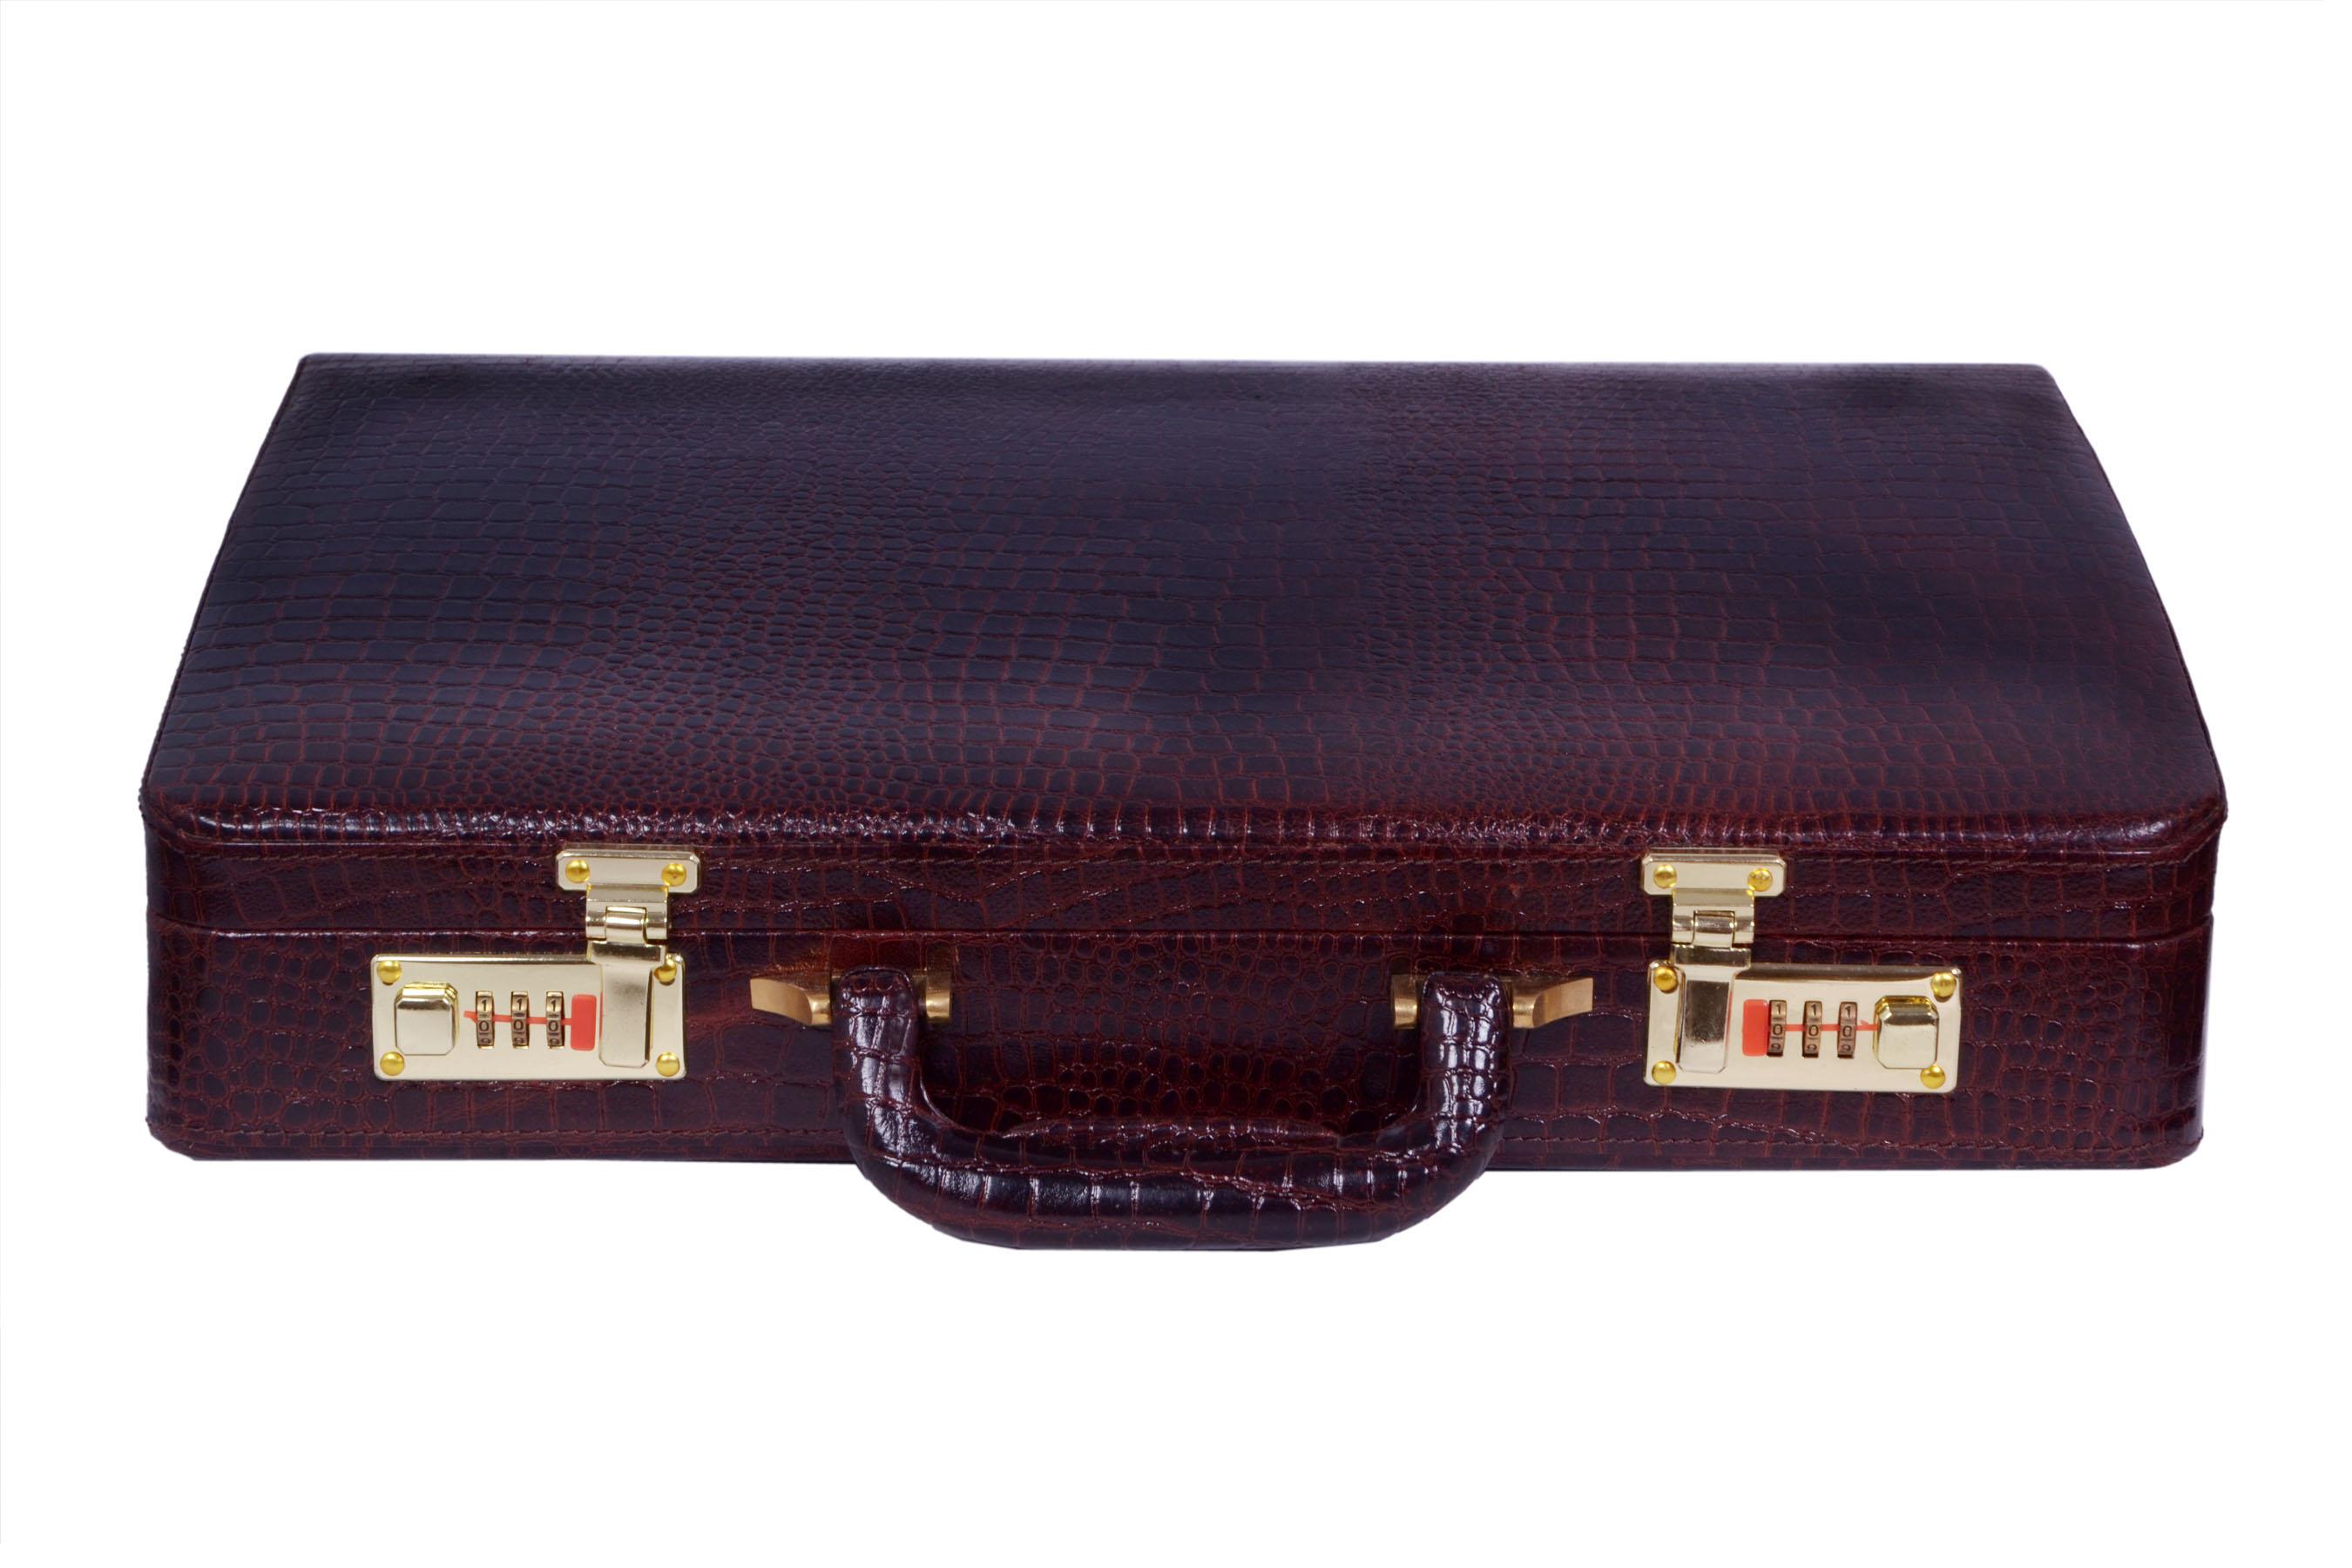 416645e97 Zint Genuine Leather Vintage Style Hard Briefcase with Combination Locks  BrownBriefcase Crocodile Print